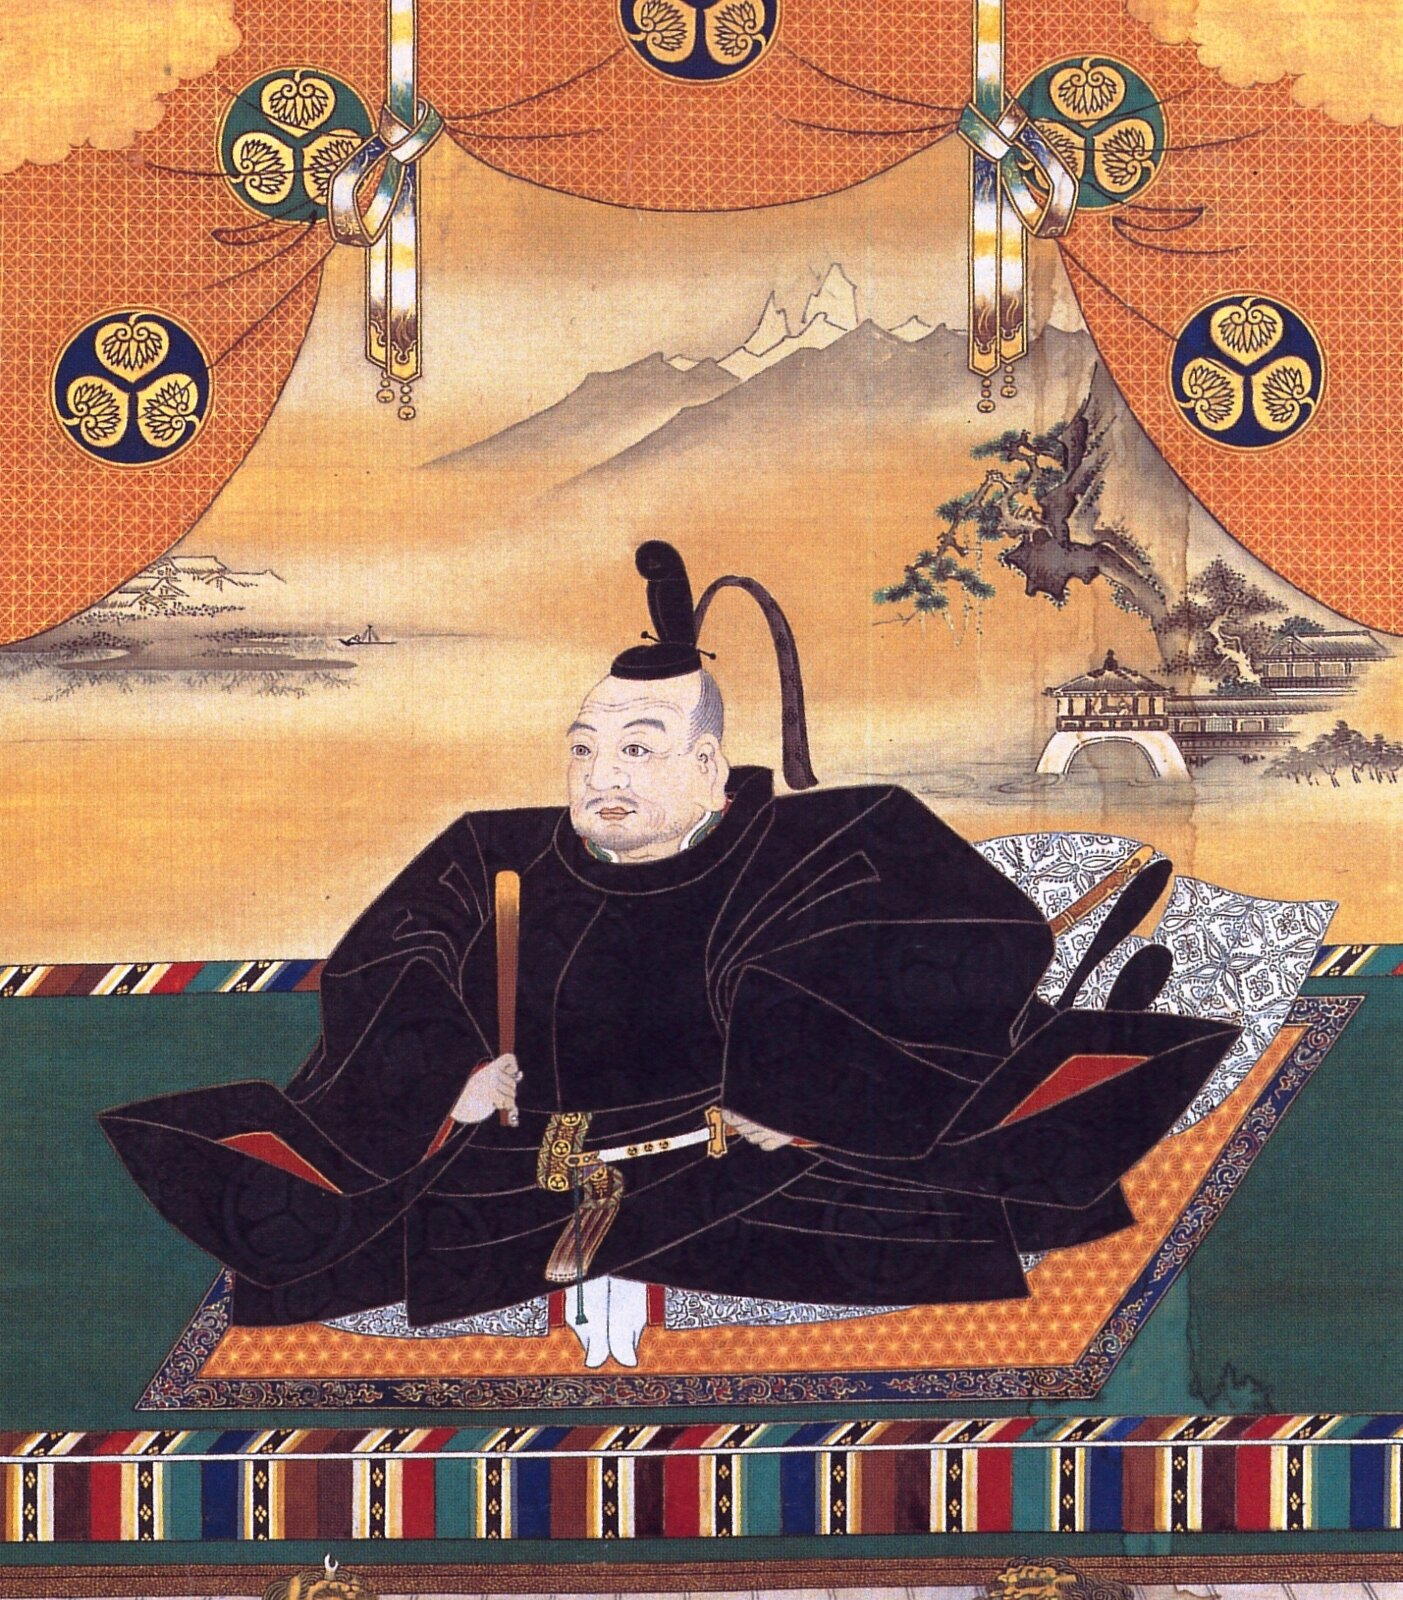 Szogun Tokugawa Iejsu Źródło: Kanō Tan'yū, Szogun Tokugawa Iejsu, Osaka Castle main tower, domena publiczna.